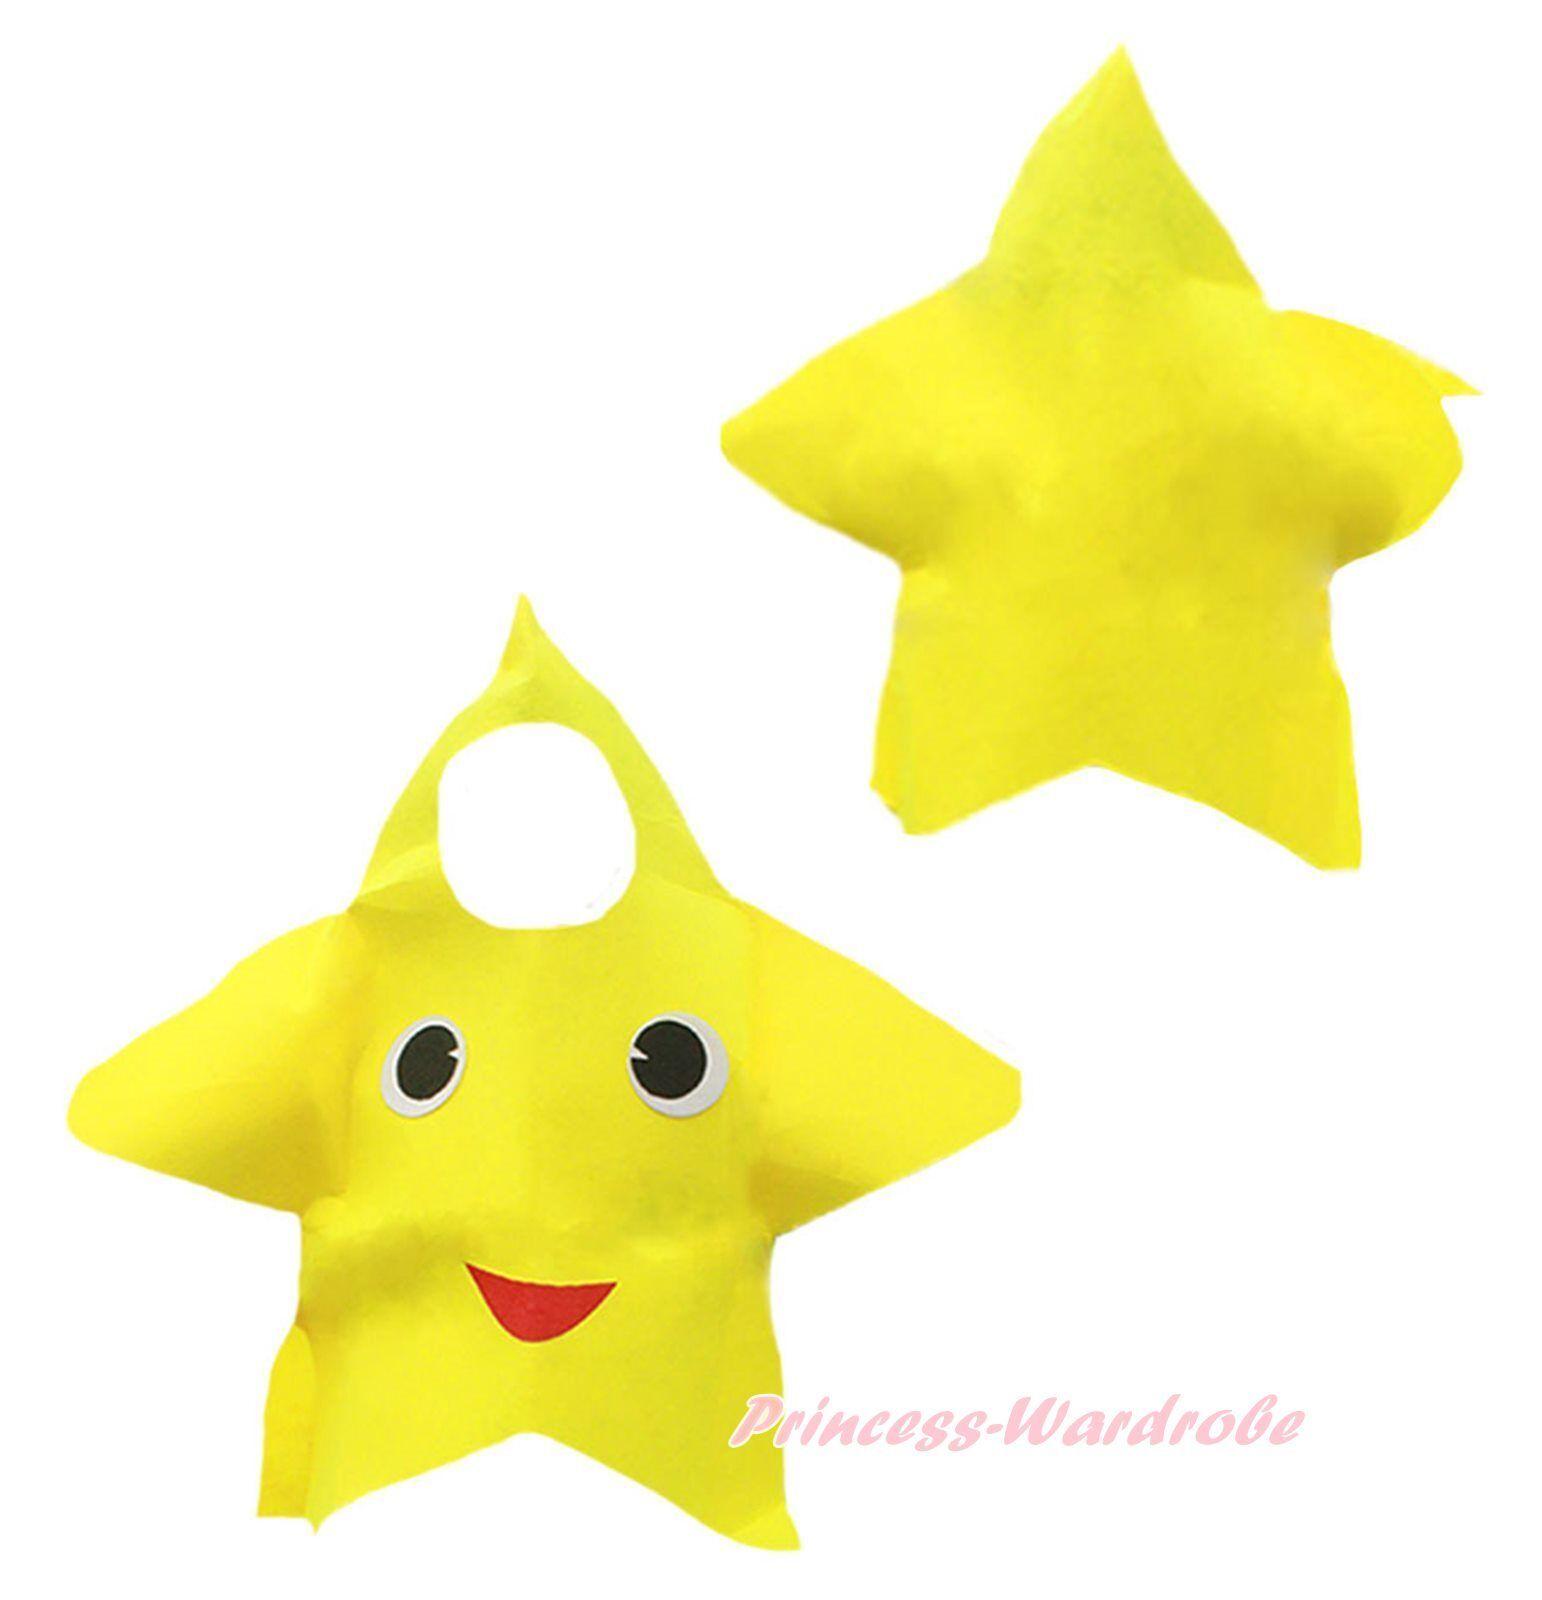 Halloween School Party Yellow Star Kids Children Unisex Costume Cosplay Wear